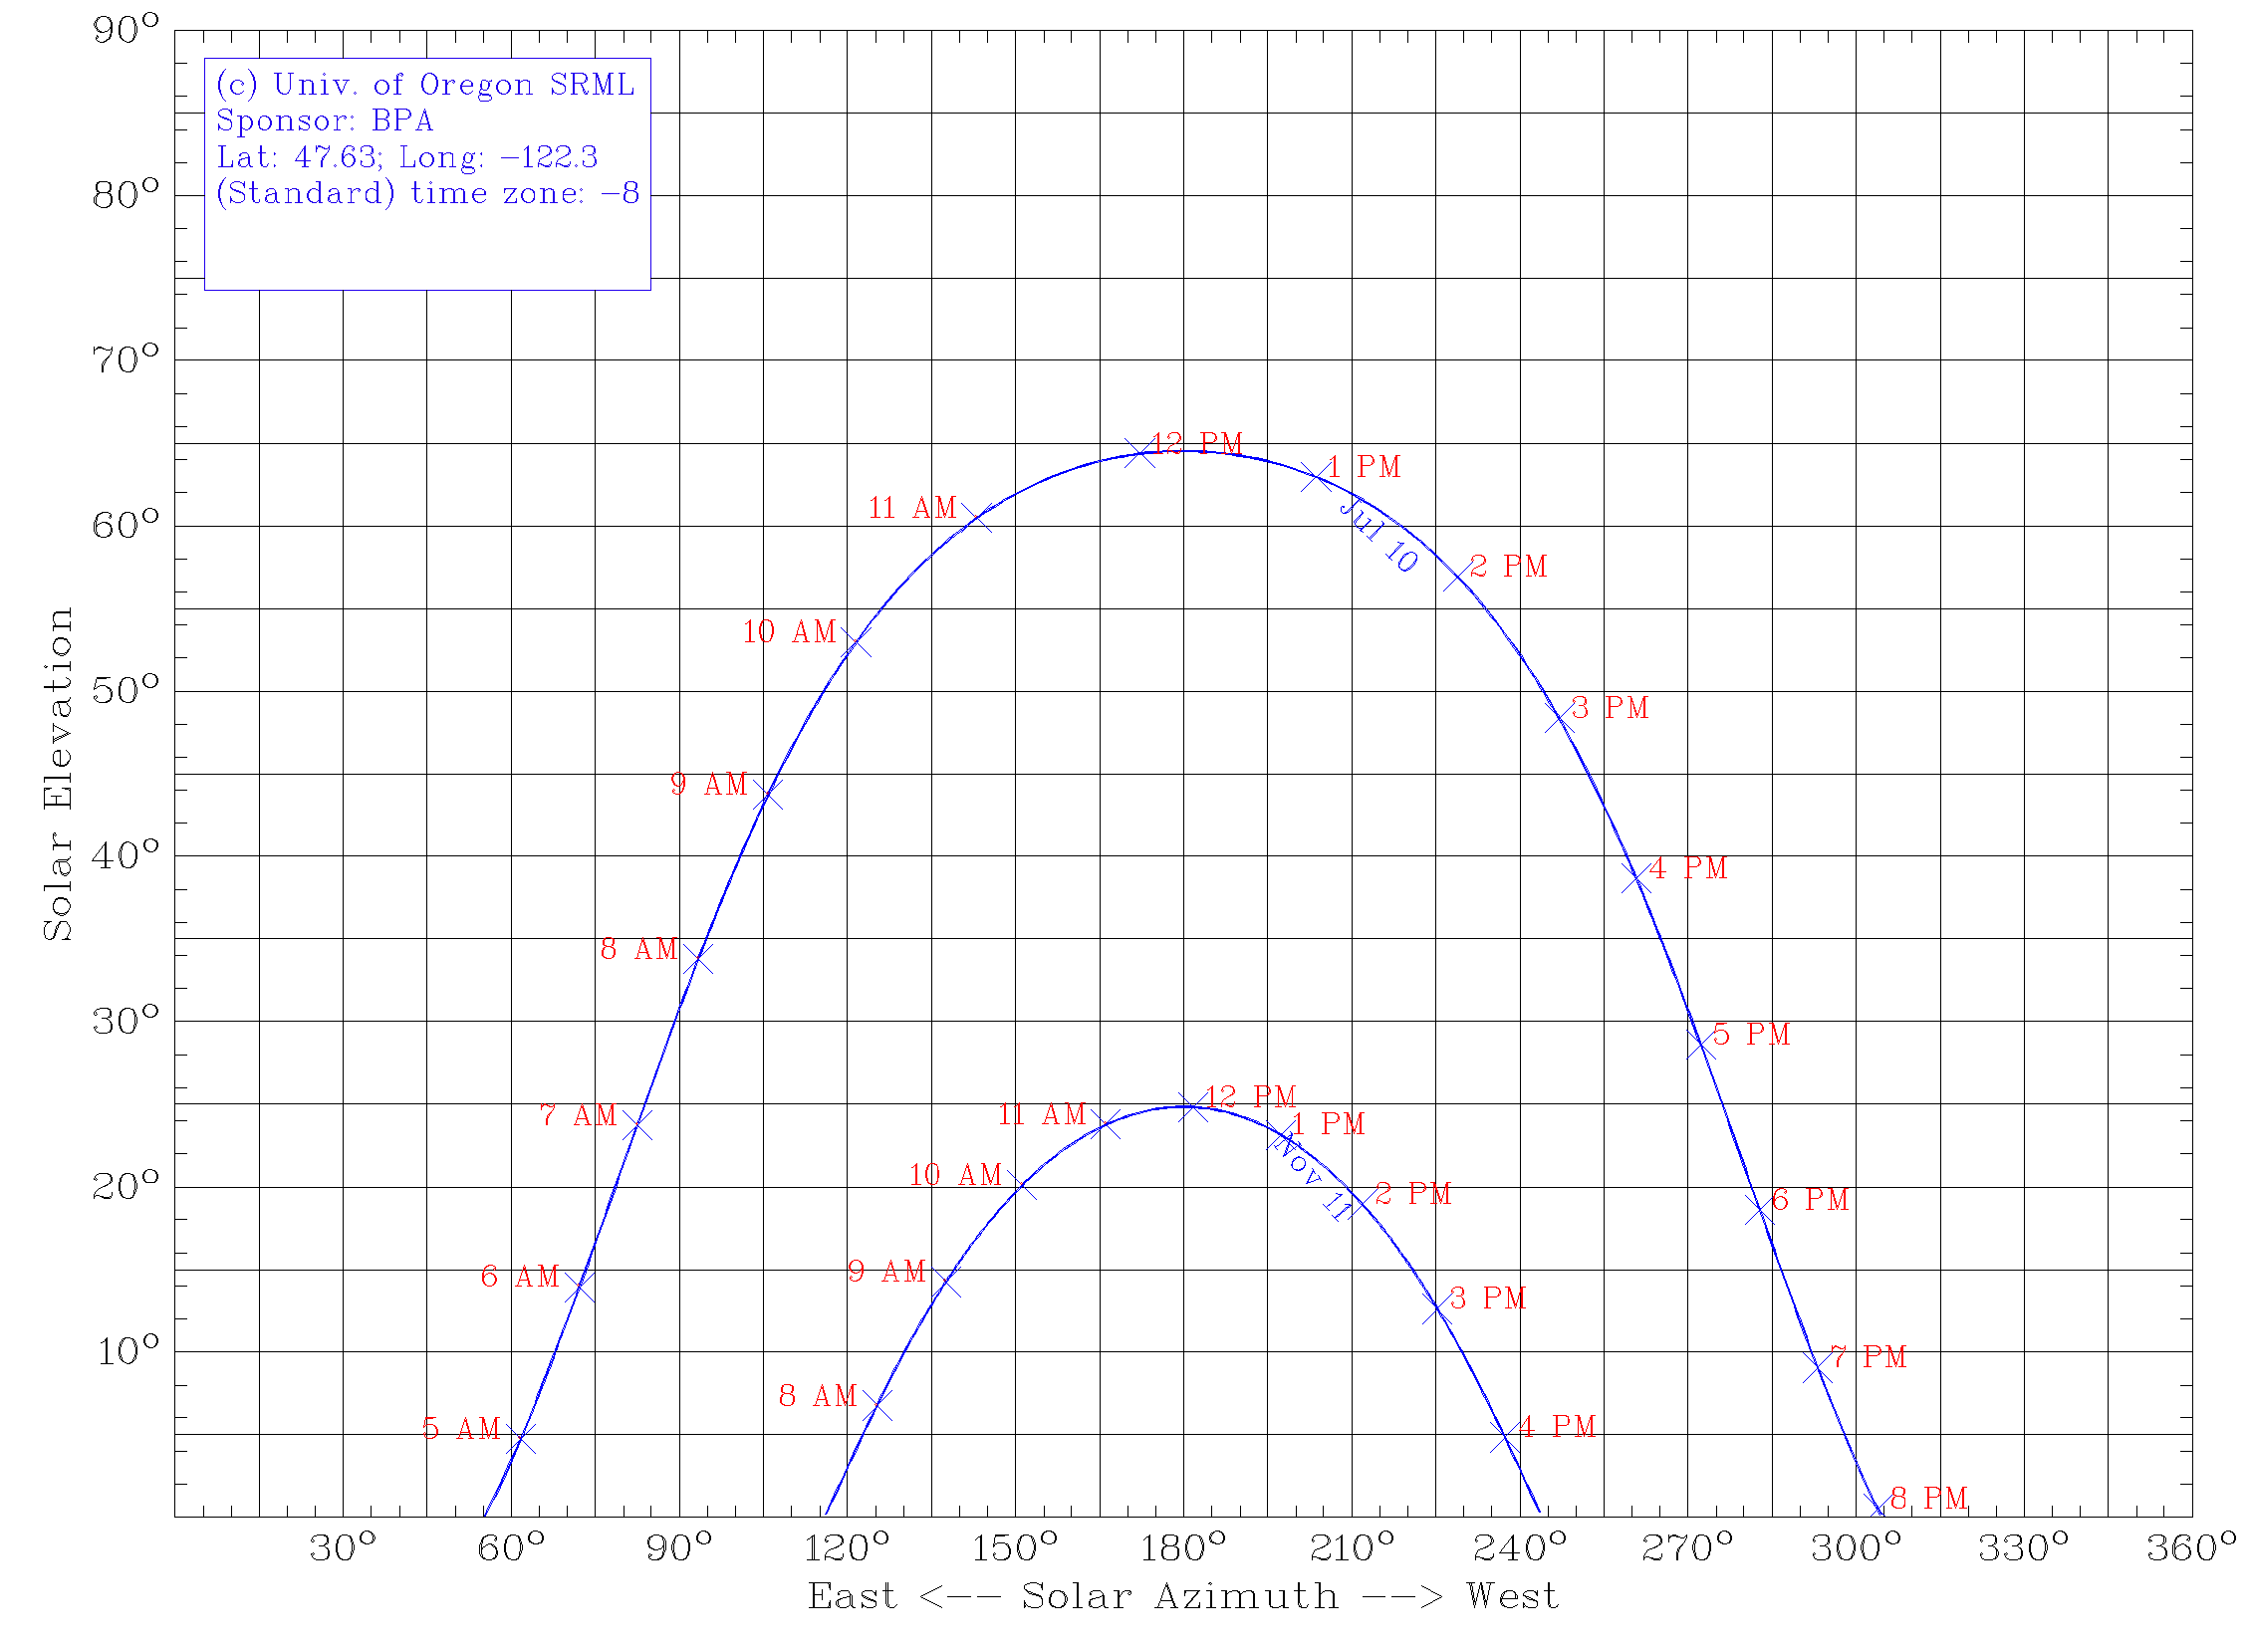 Sun angle chart generated athttp://solardat.uoregon.edu/SunChartProgram.html